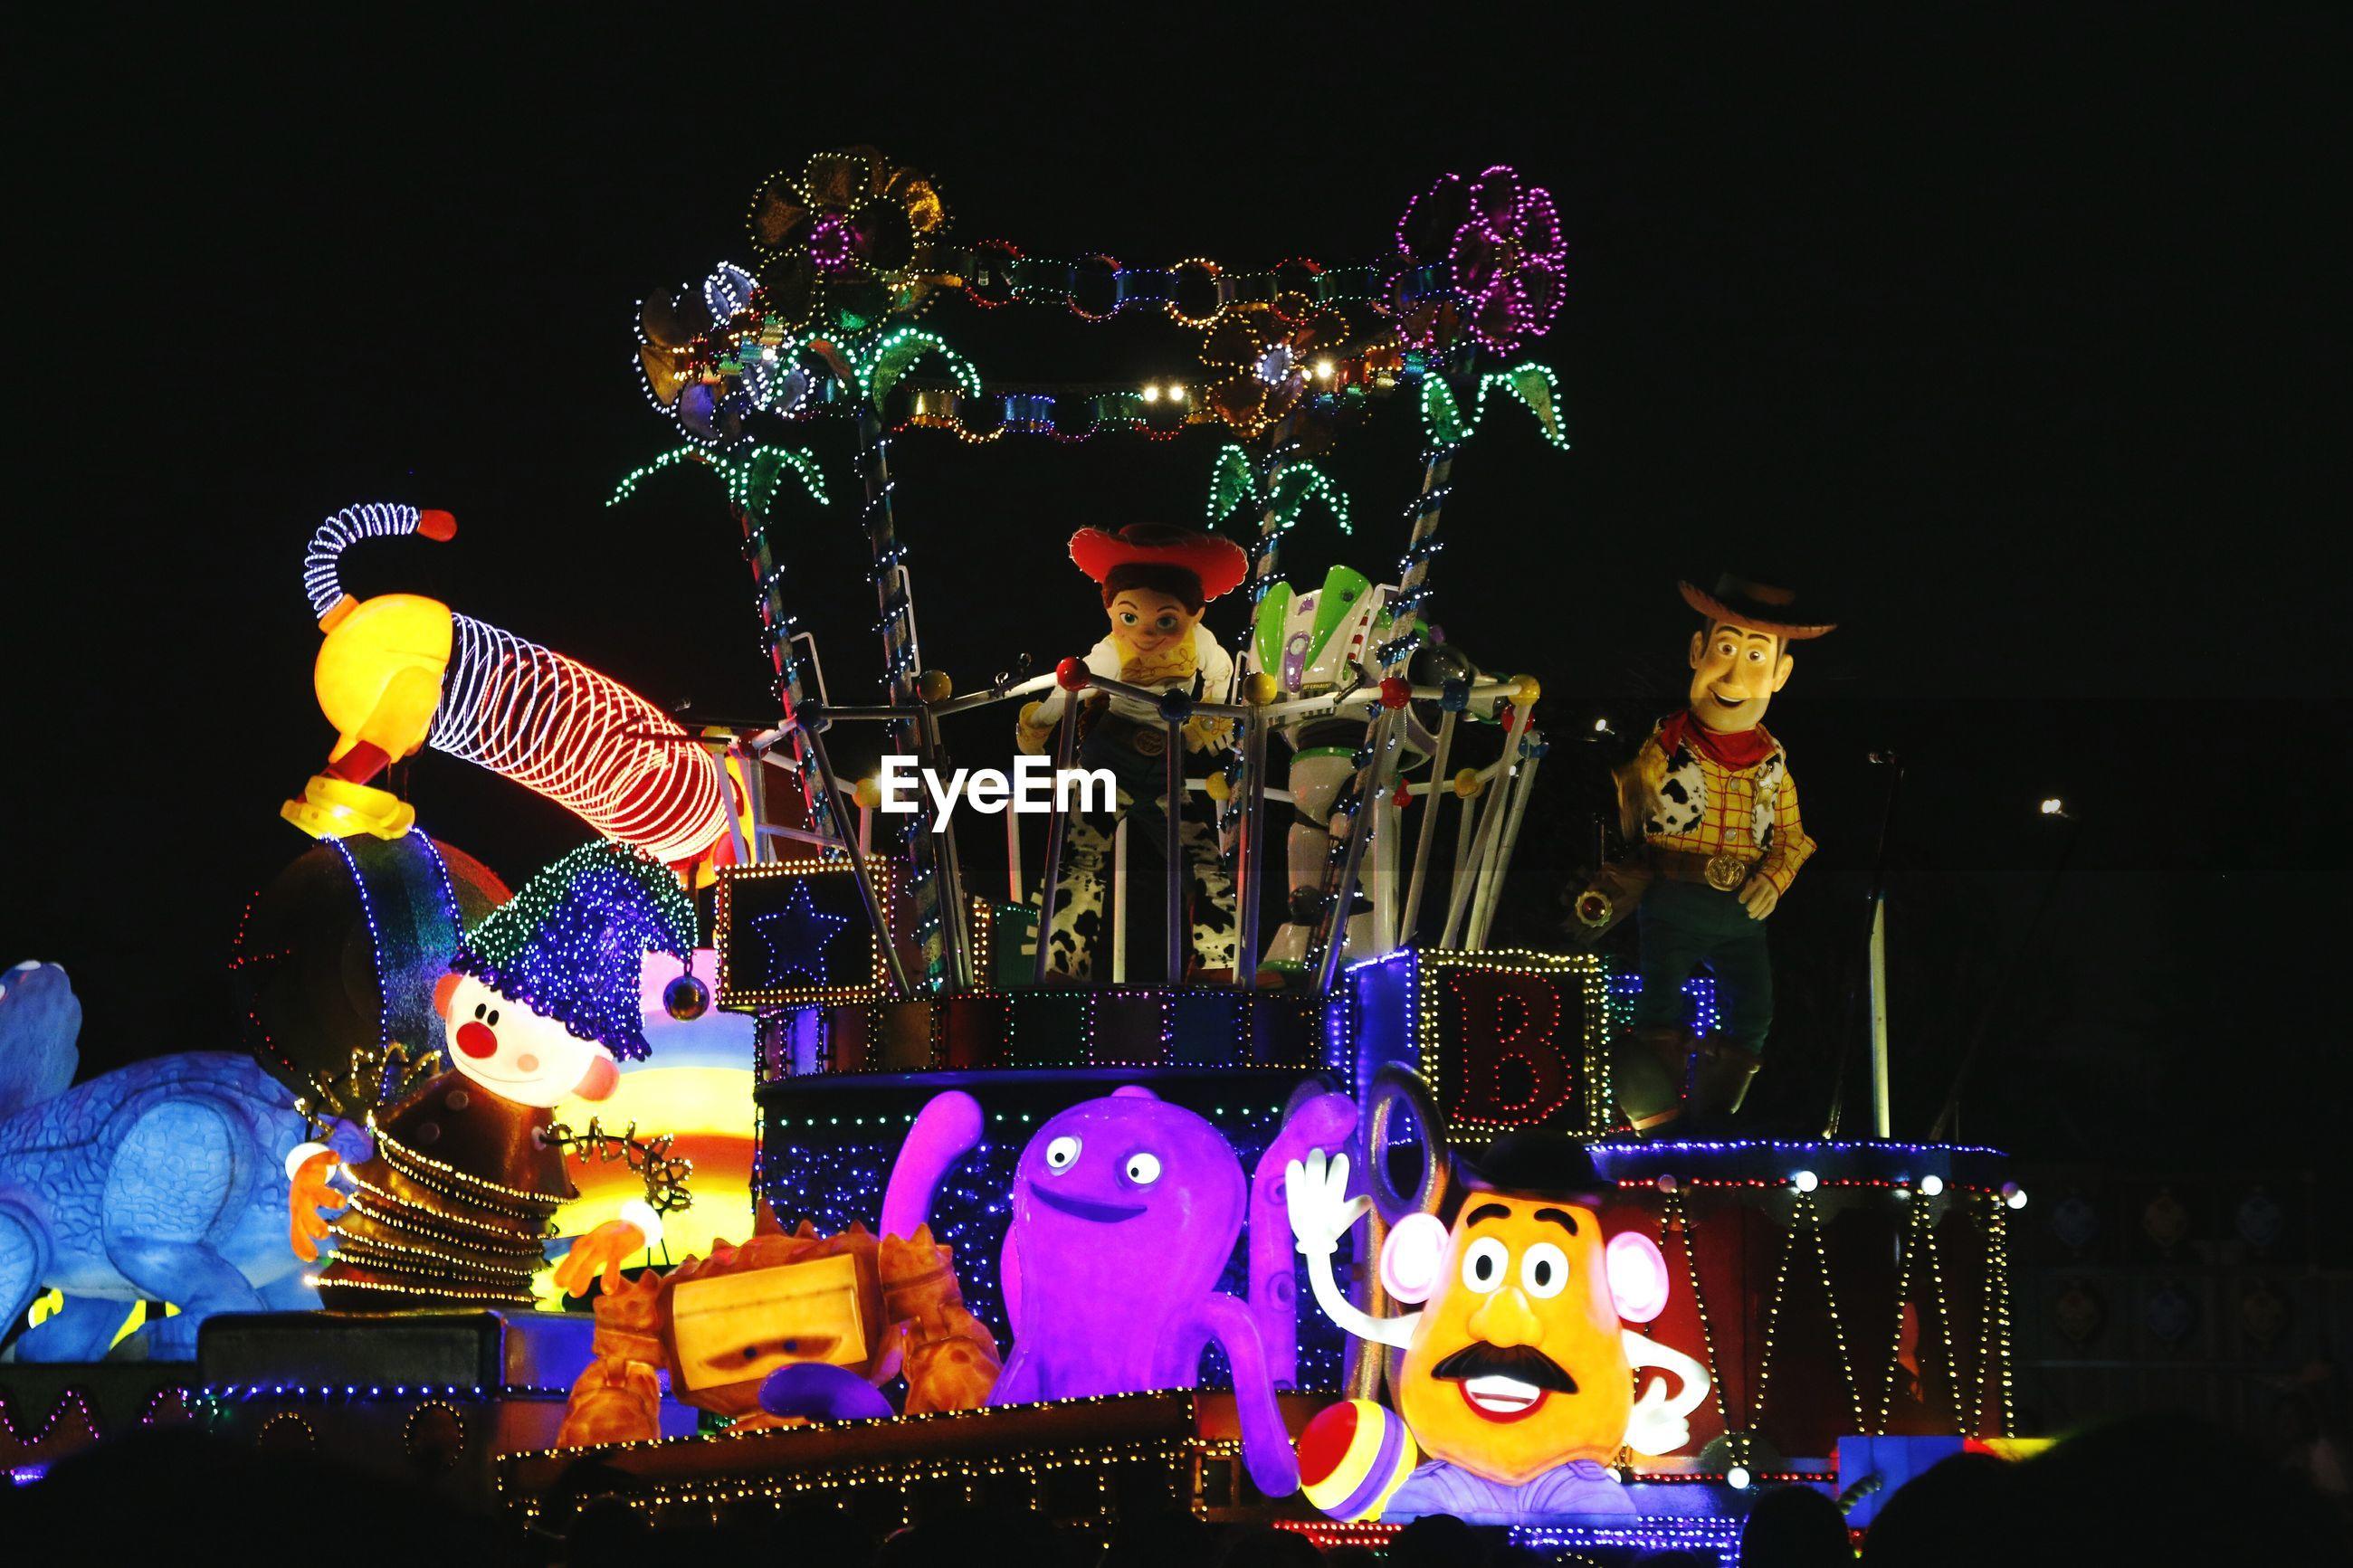 ILLUMINATED CHRISTMAS LIGHTS AT AMUSEMENT PARK RIDE